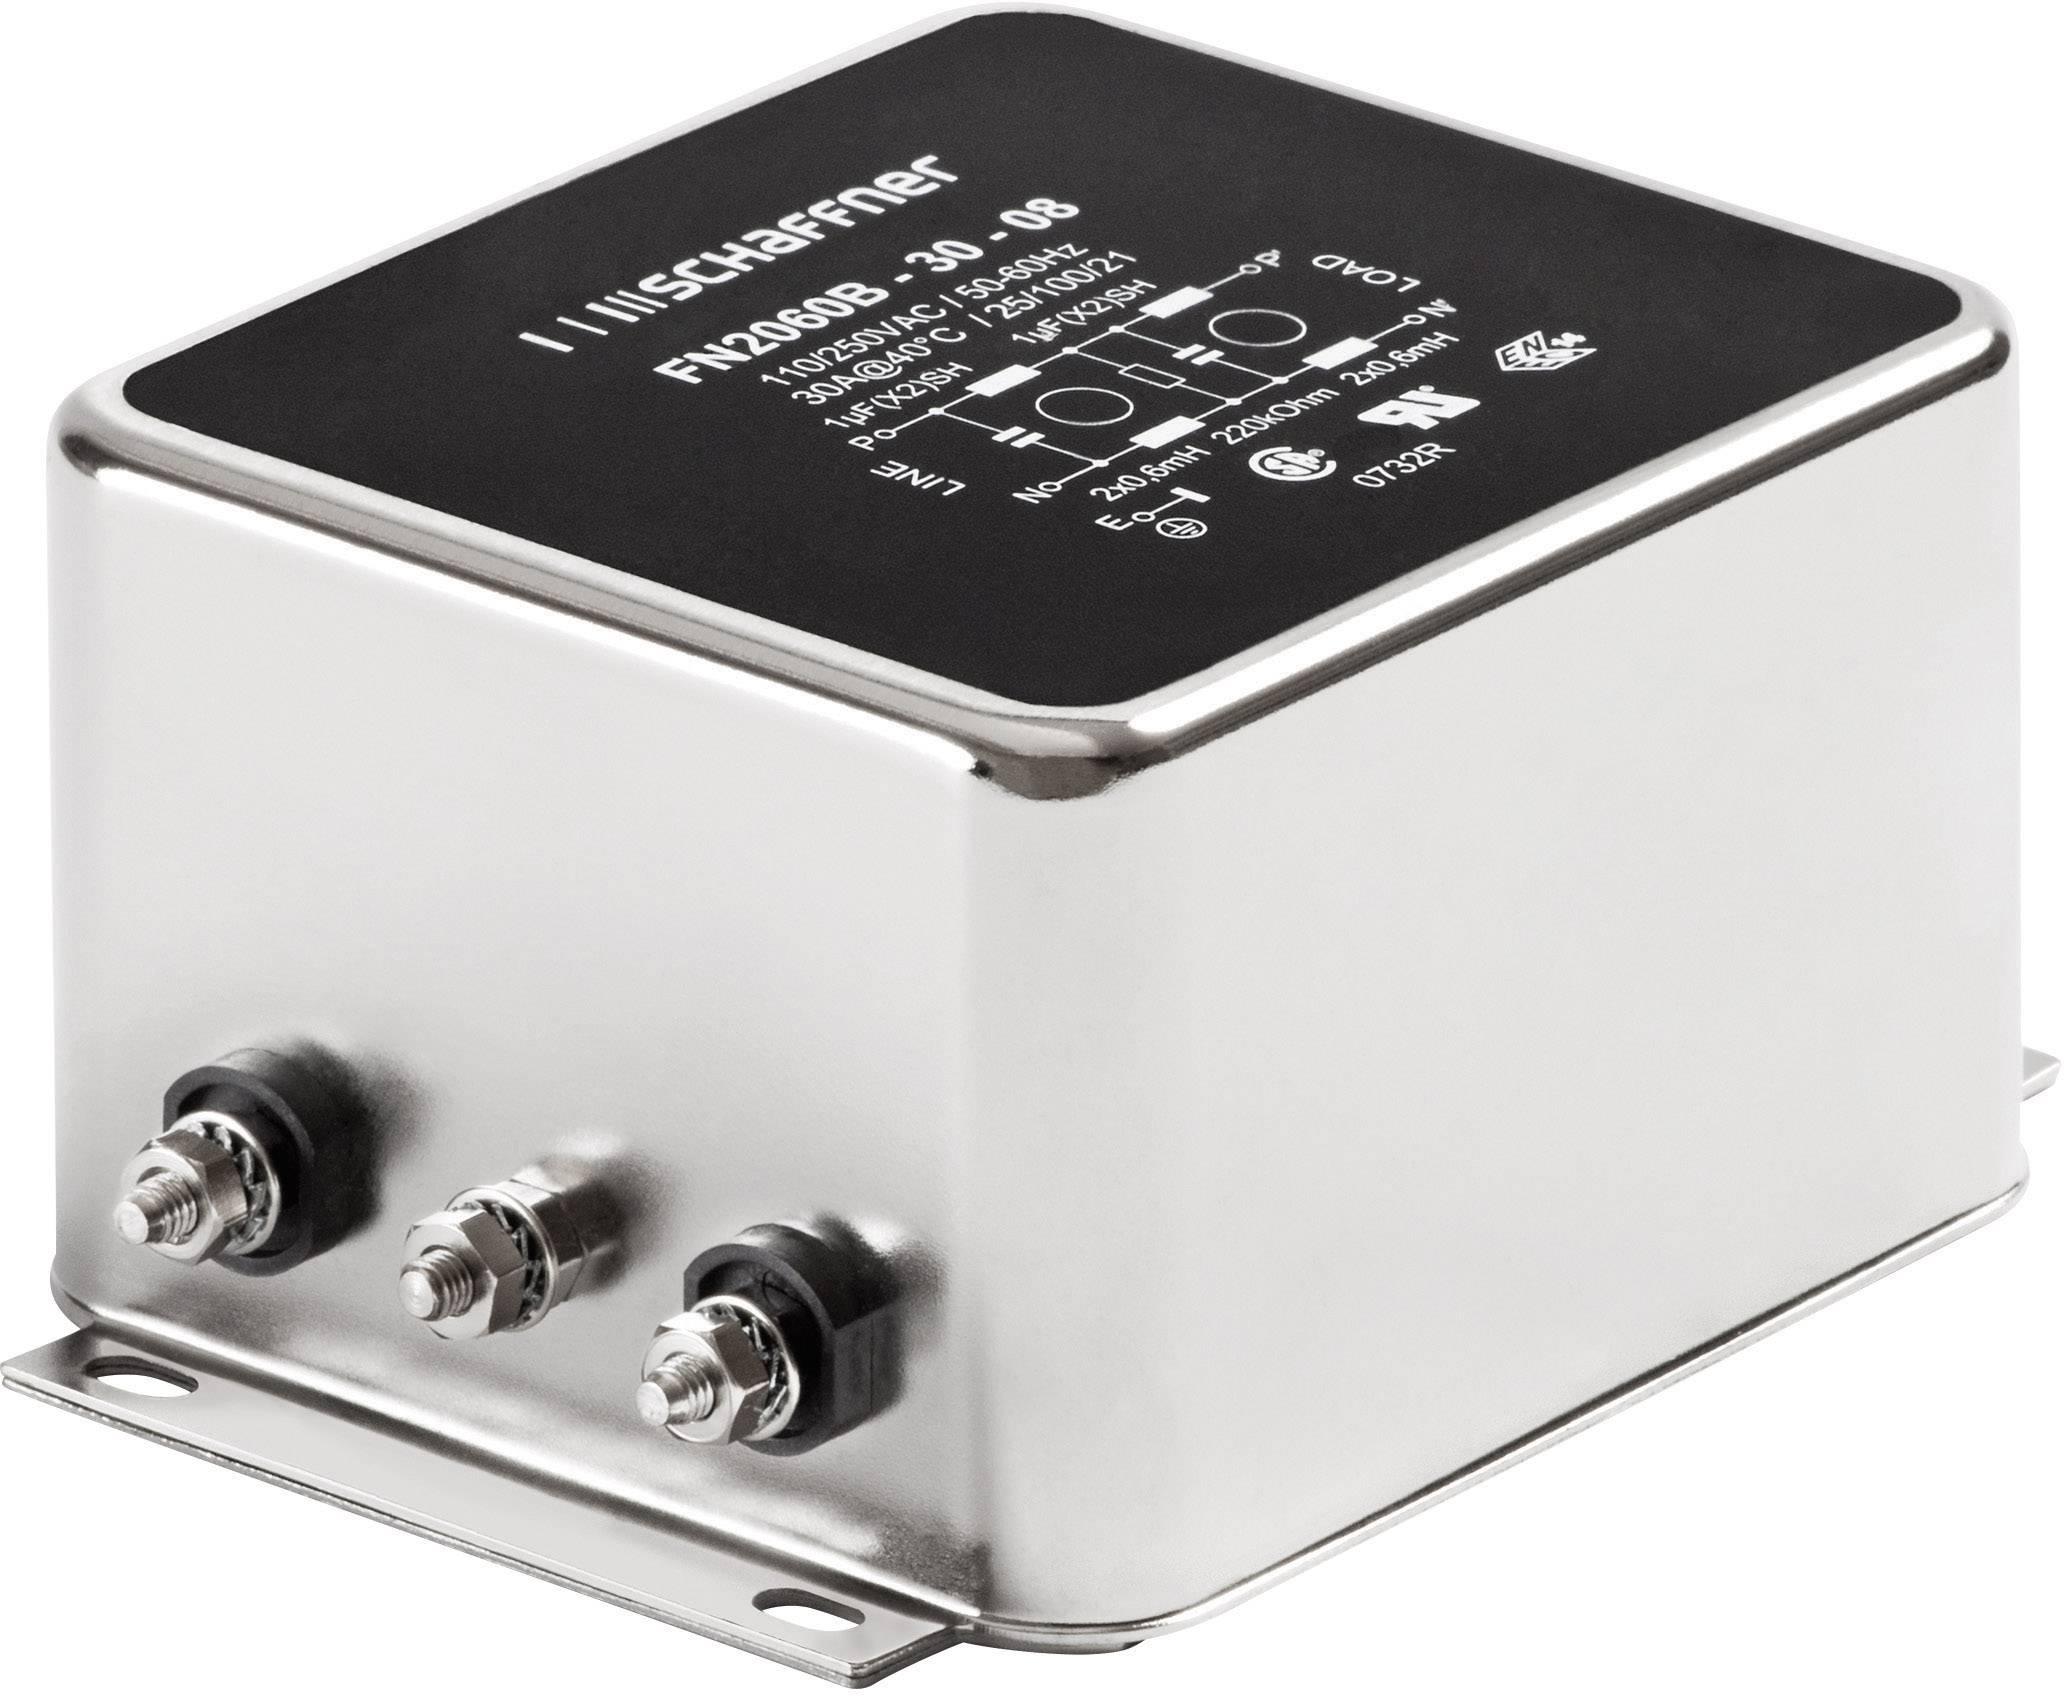 Síťový filtr Schaffner, FN 2060-1-06, 12 mH, 250 V/AC, 1 A